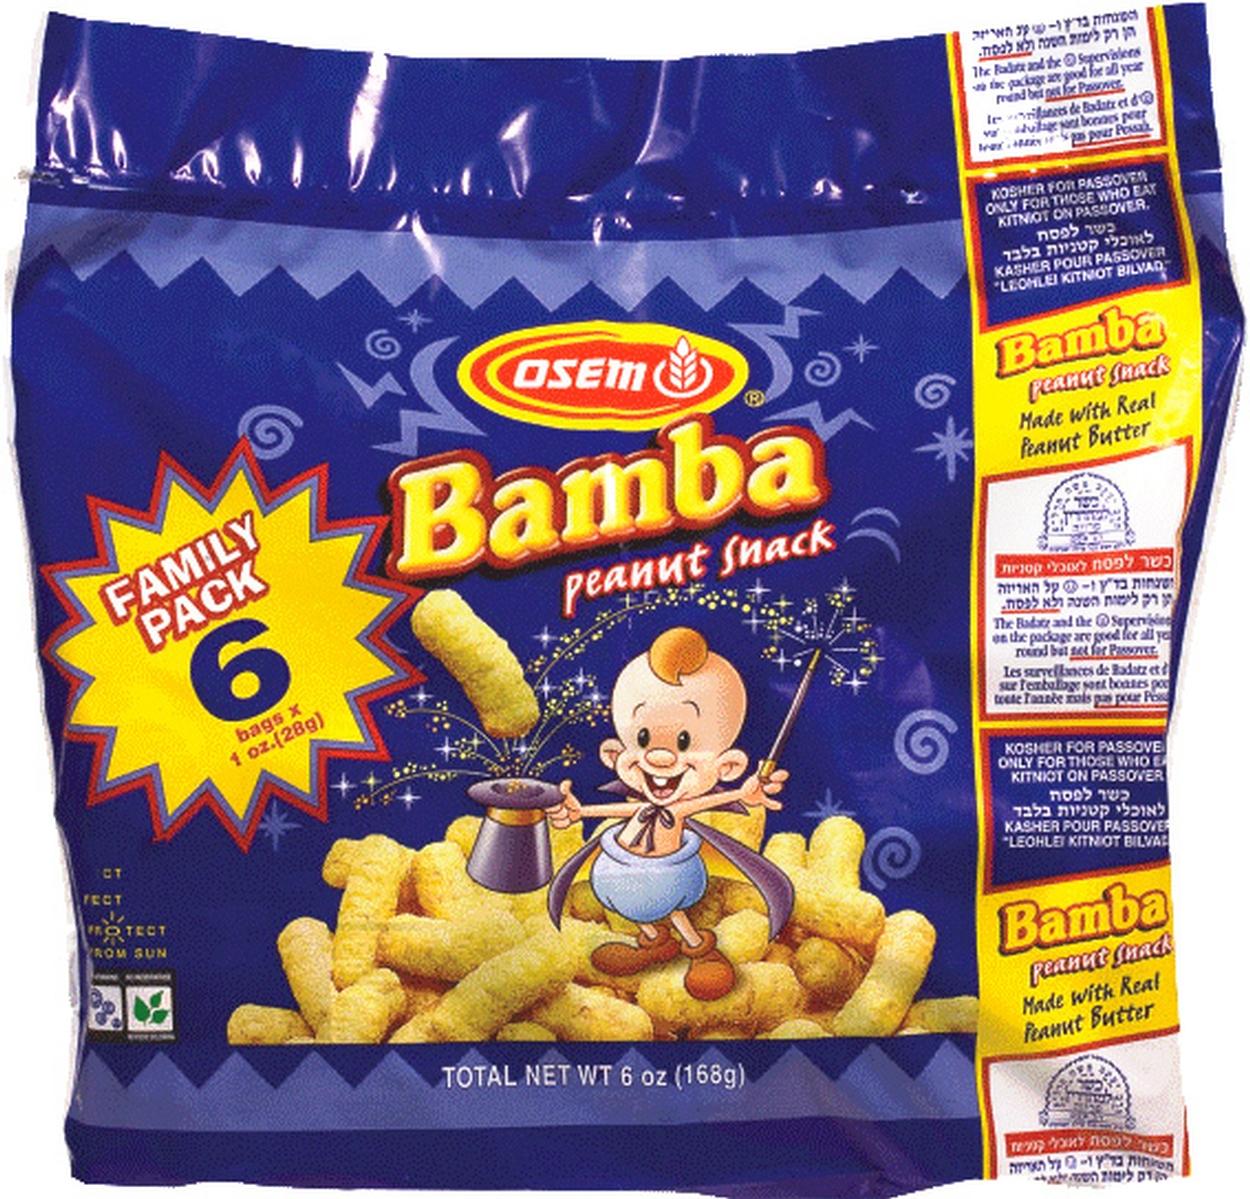 passover bamba peanut snack 6 pack kitnios passover cereal